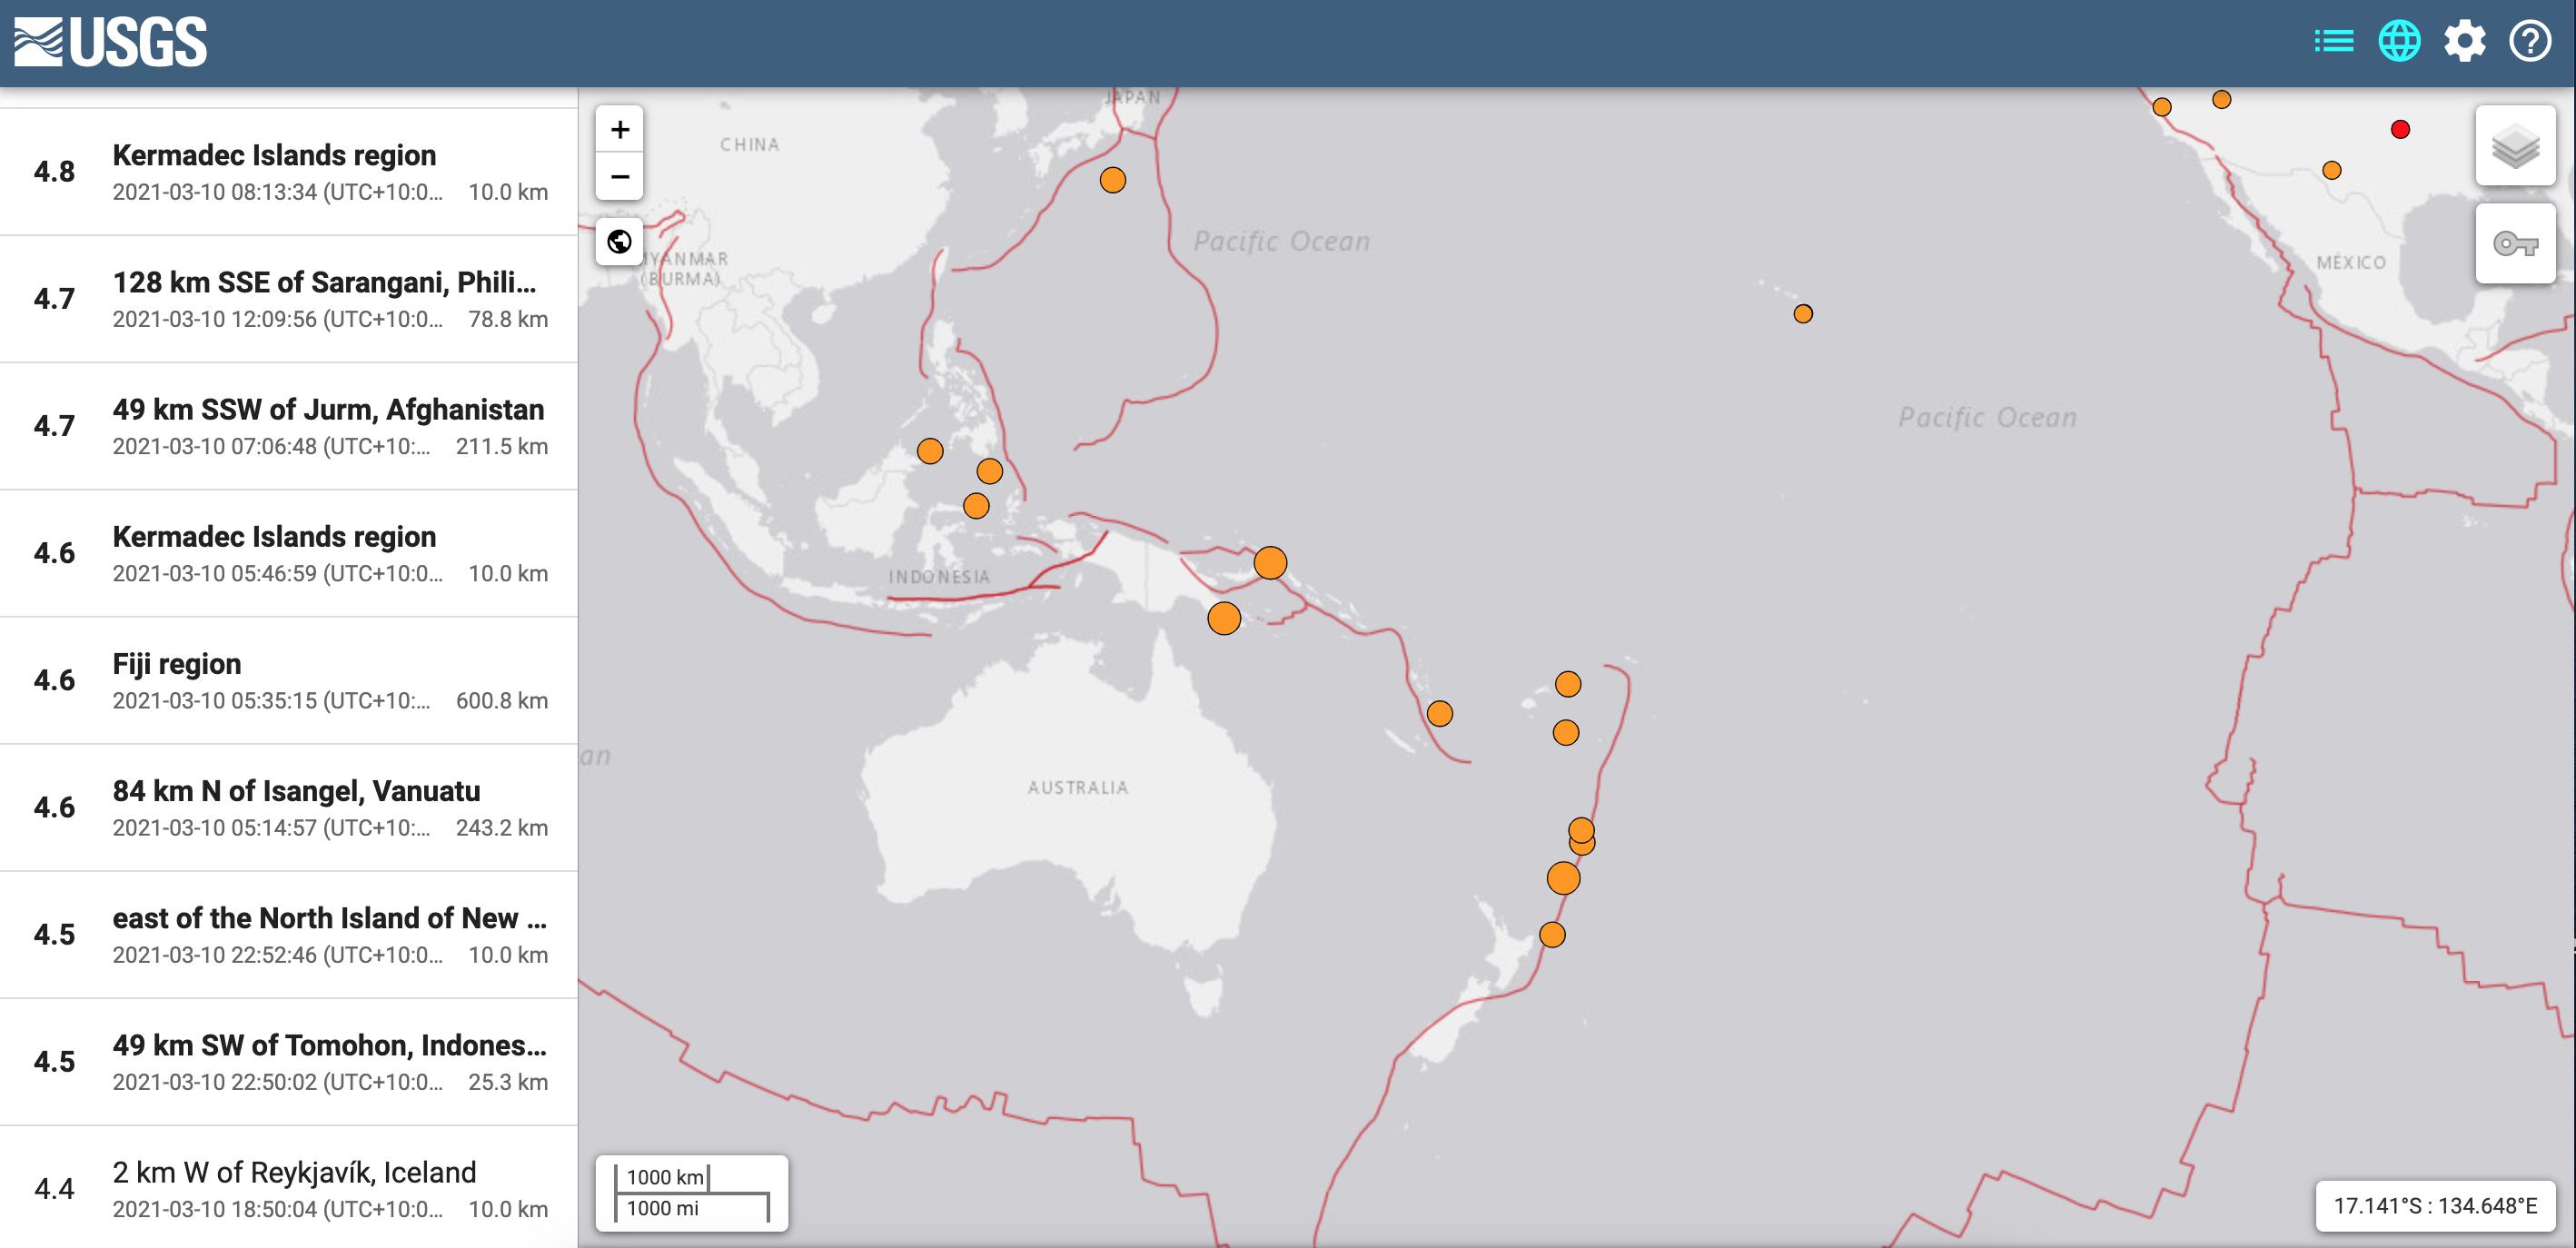 Earthquakes on map